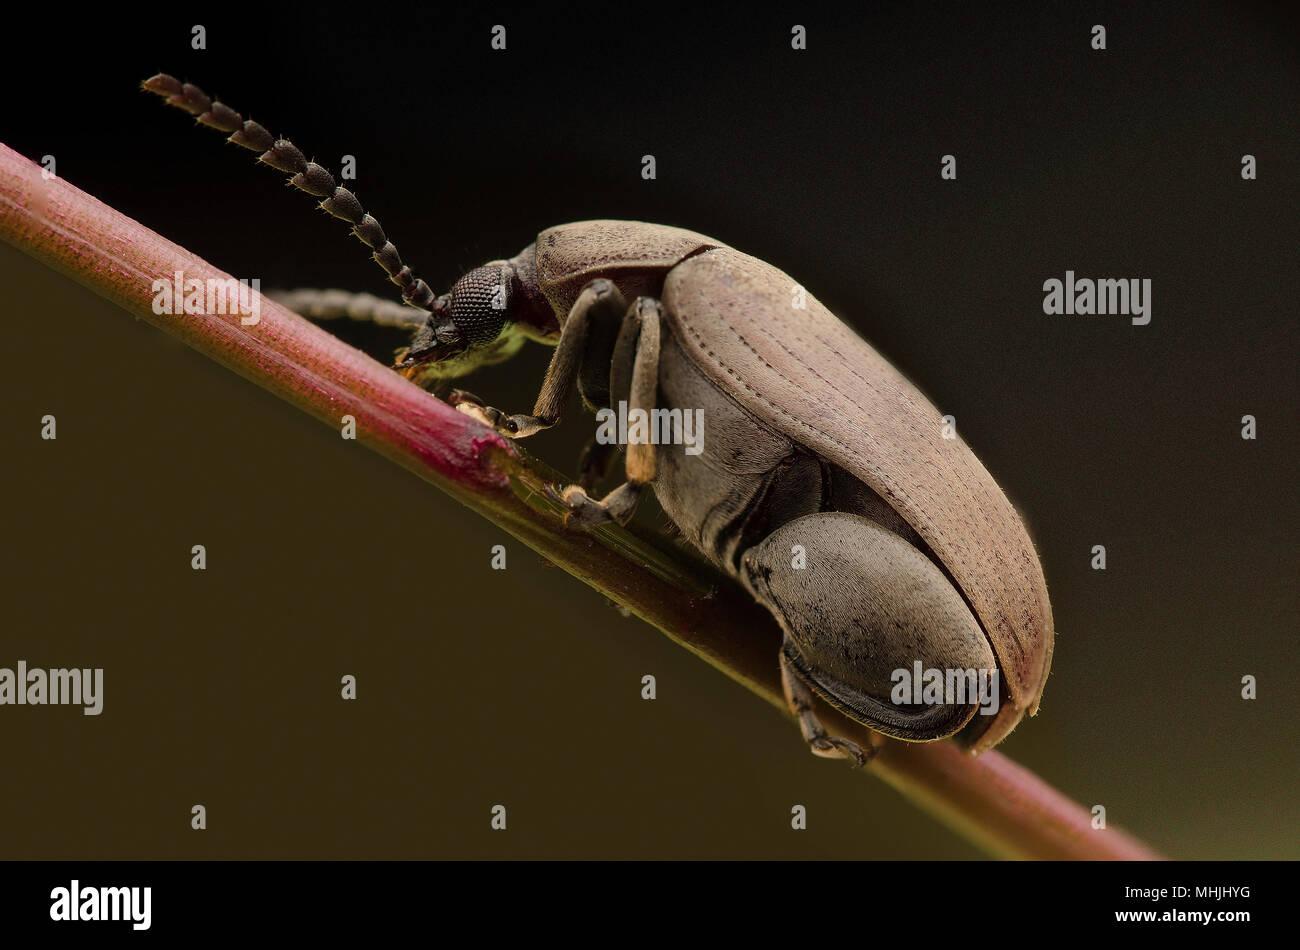 Chrysomelidae - Stock Image